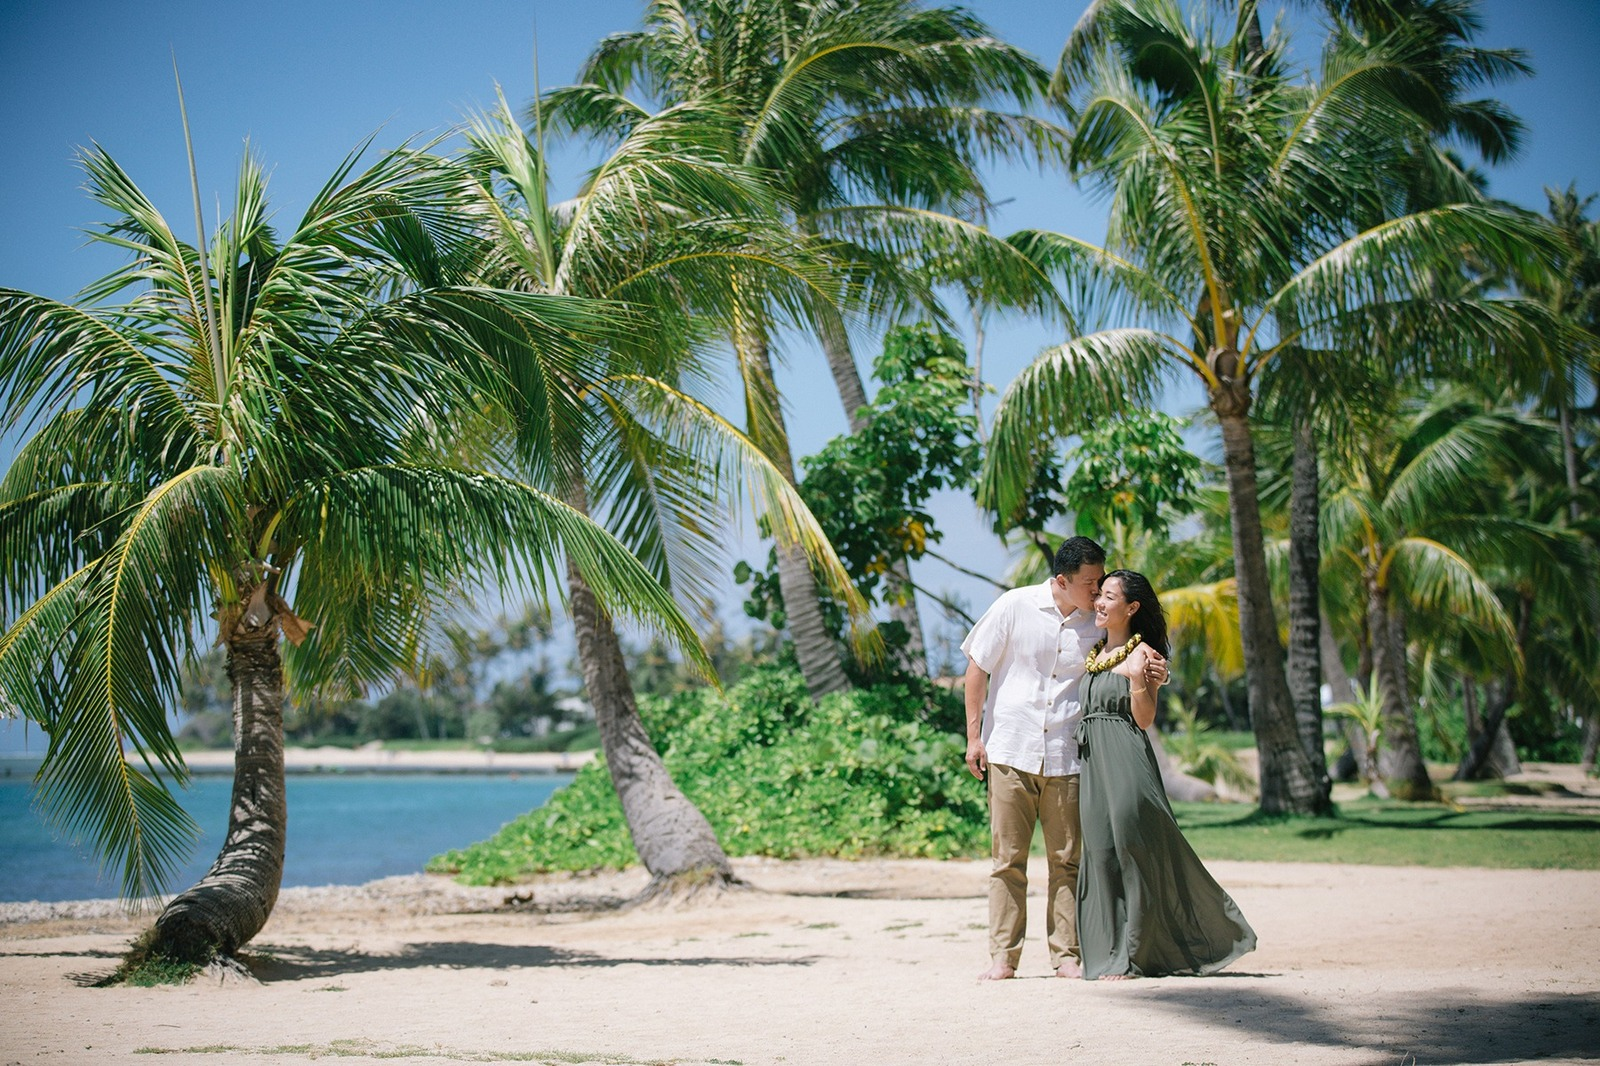 Oahu Engagement Photographer Tropical Kahala Beach Green Dress Palm Tress